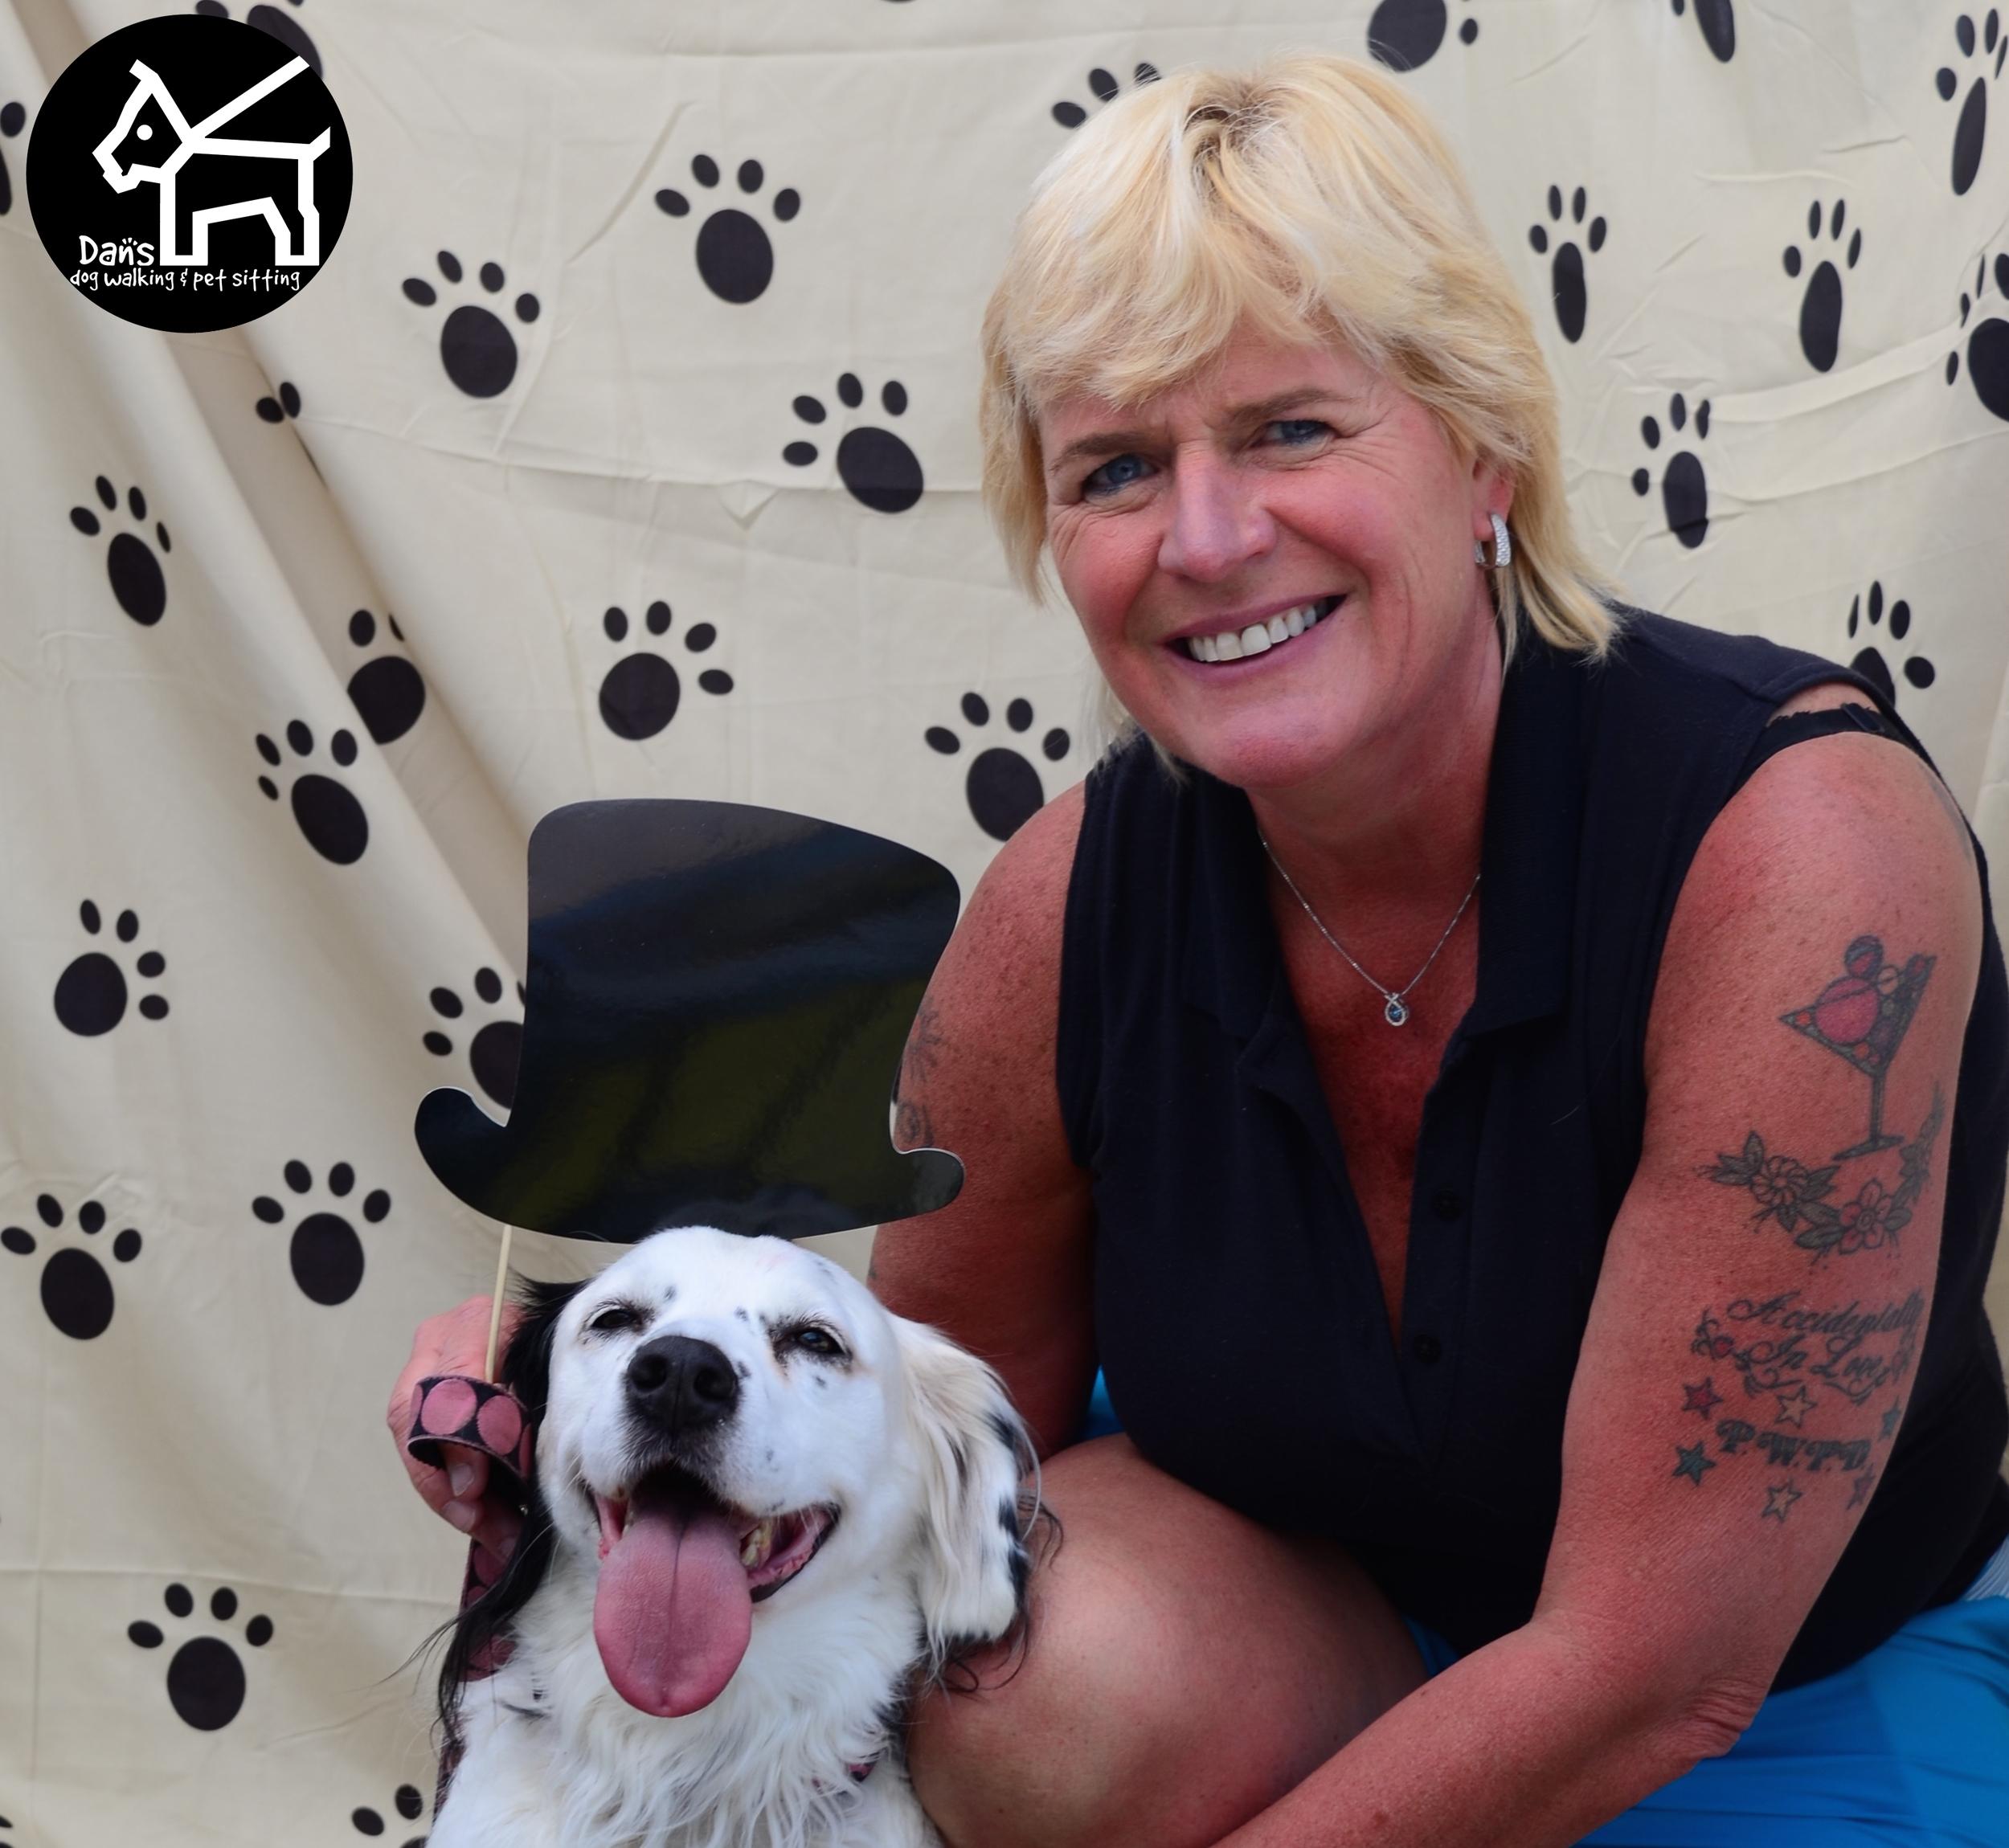 Dog with Hat Dan's Dog Walking Photobooth at Harbor Fest 2015.jpg